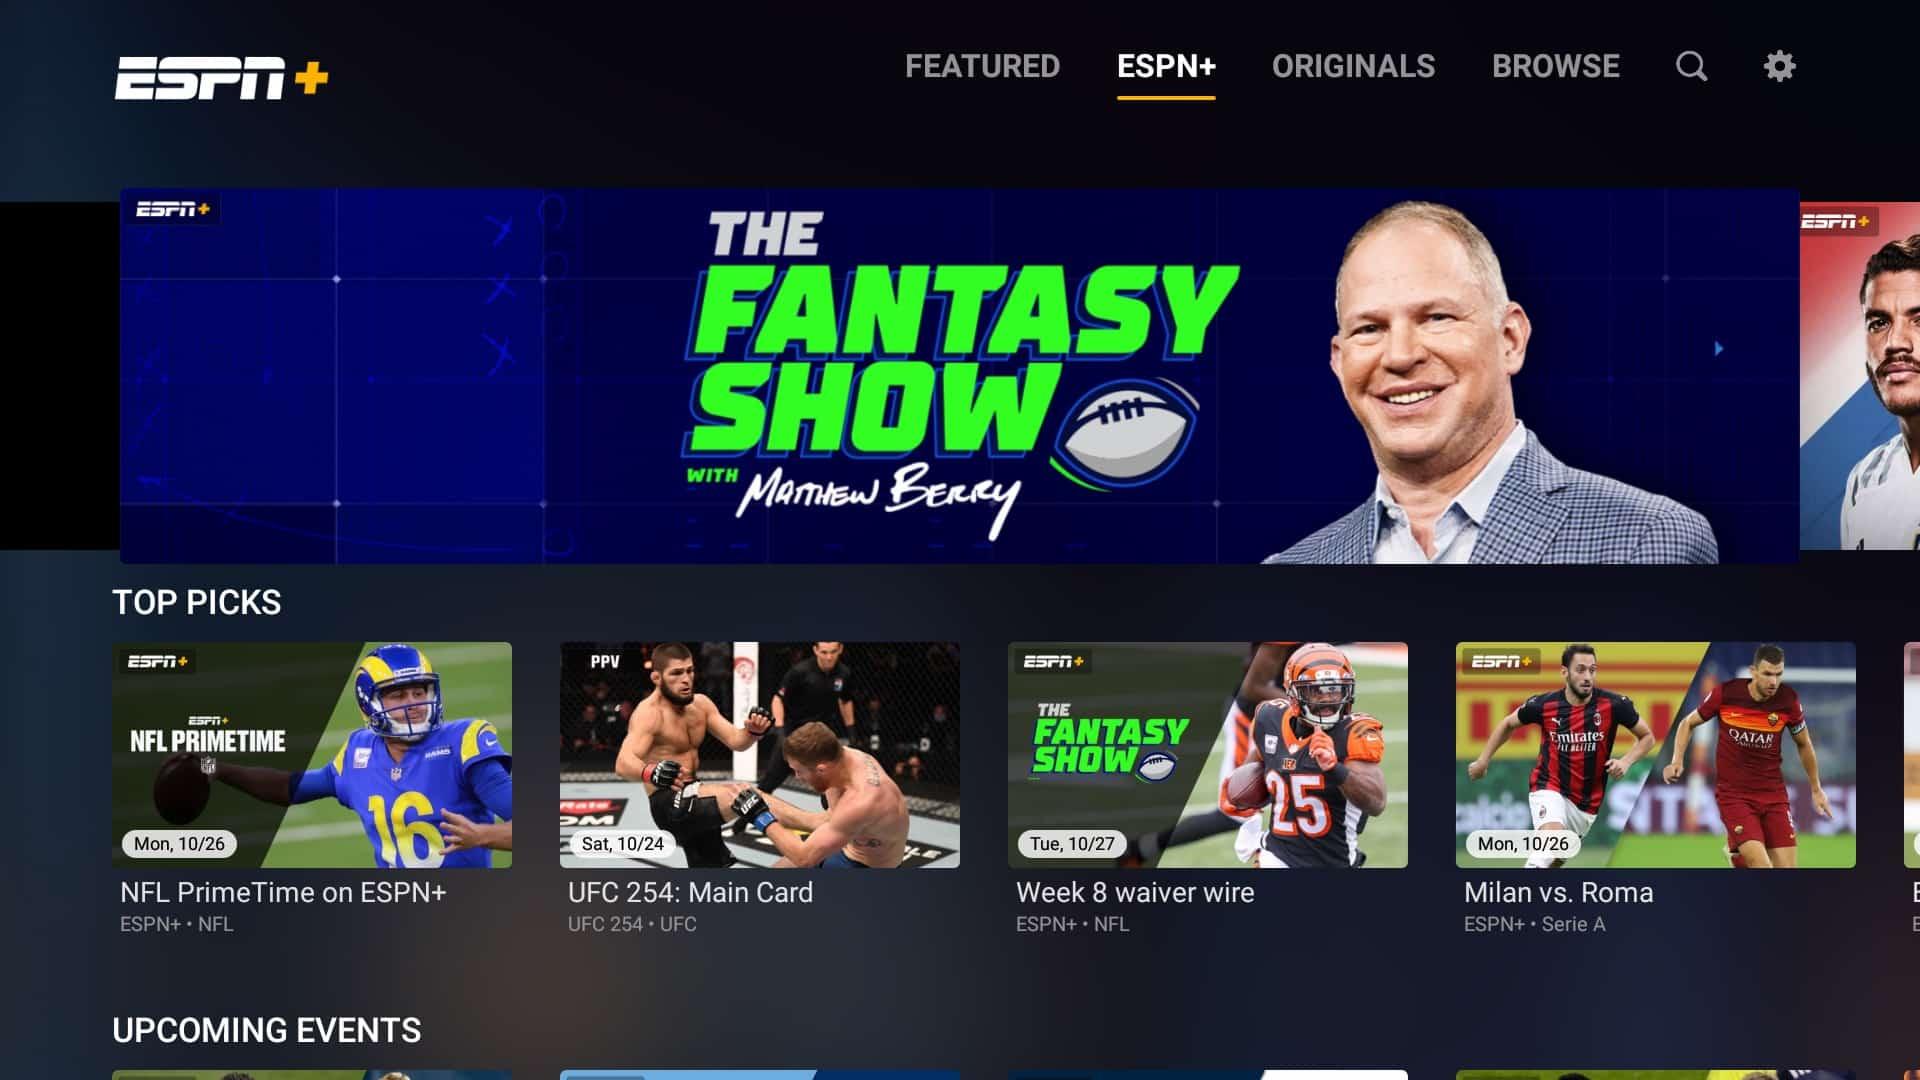 ESPN+ in the web app.